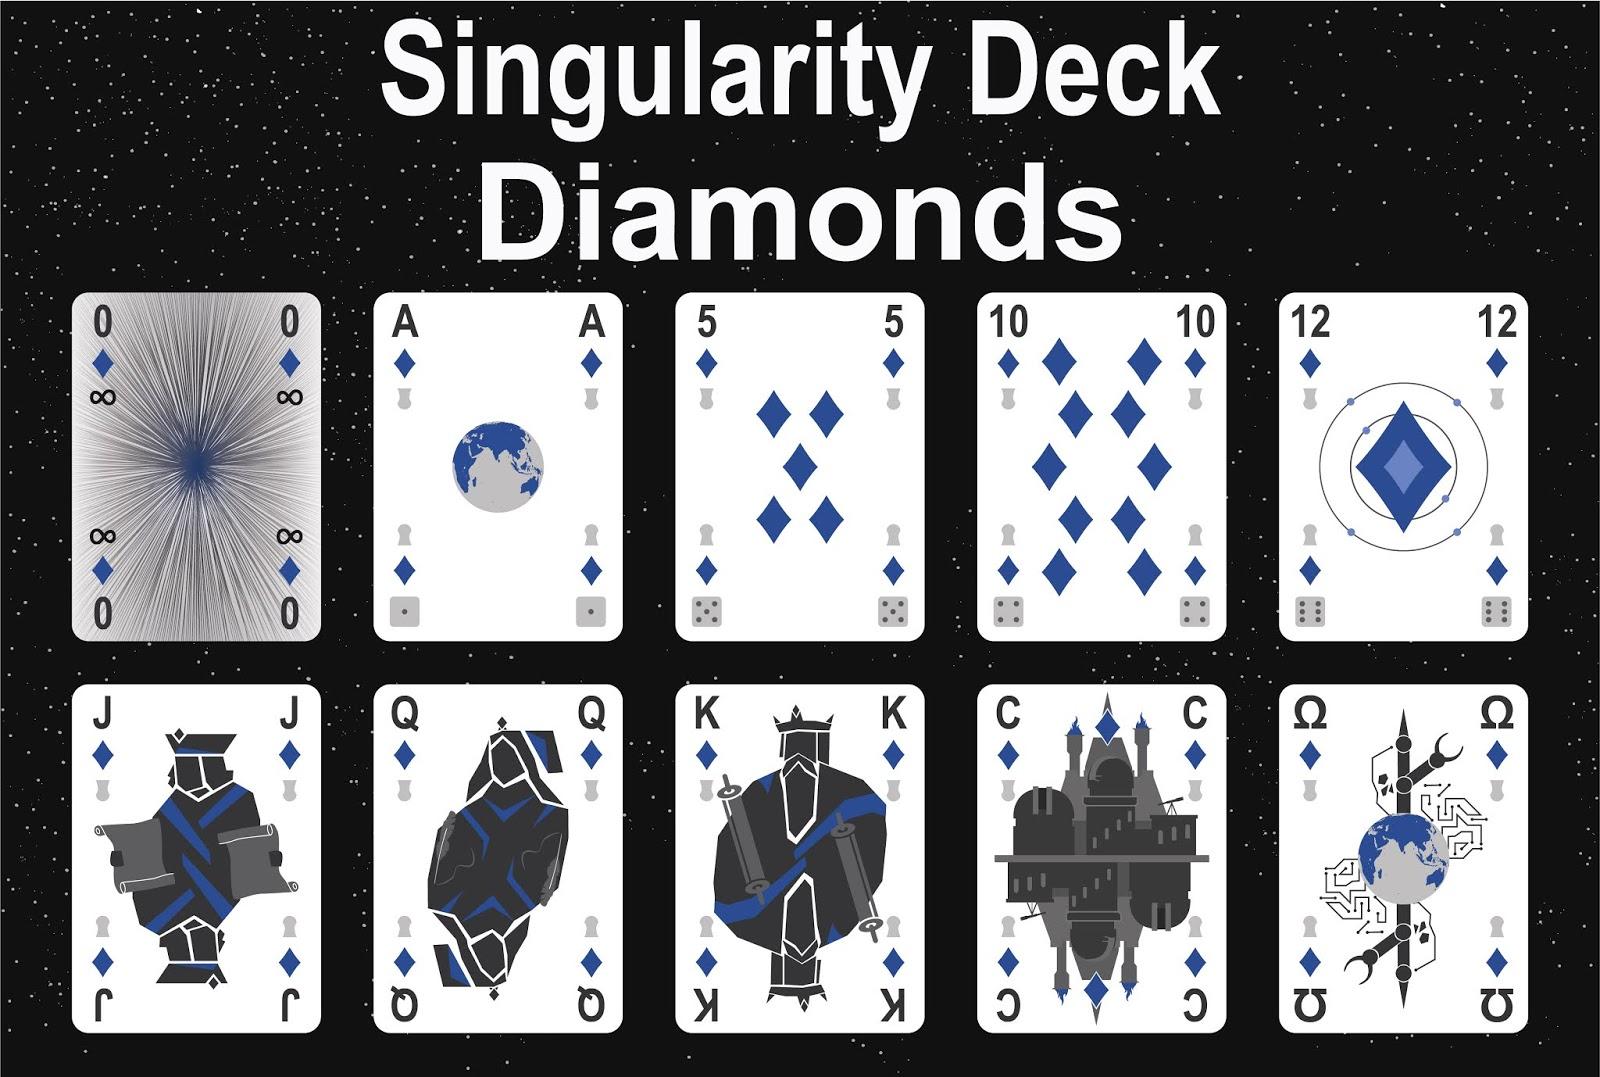 The Singularity Deck - Diamonds Art